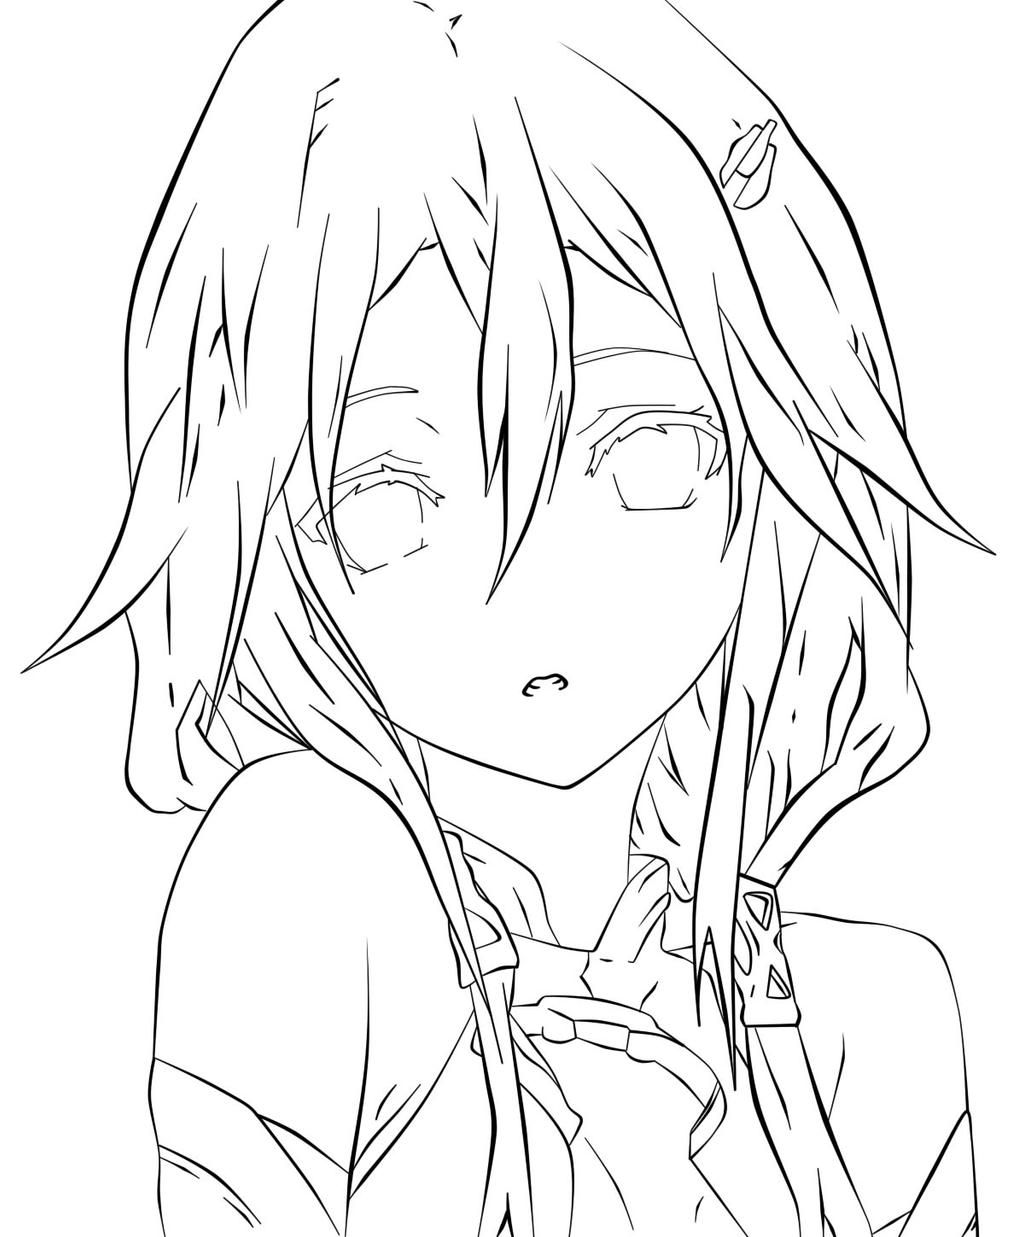 Digital Line Art : Inori yuzuriha guilty crown digital lineart by